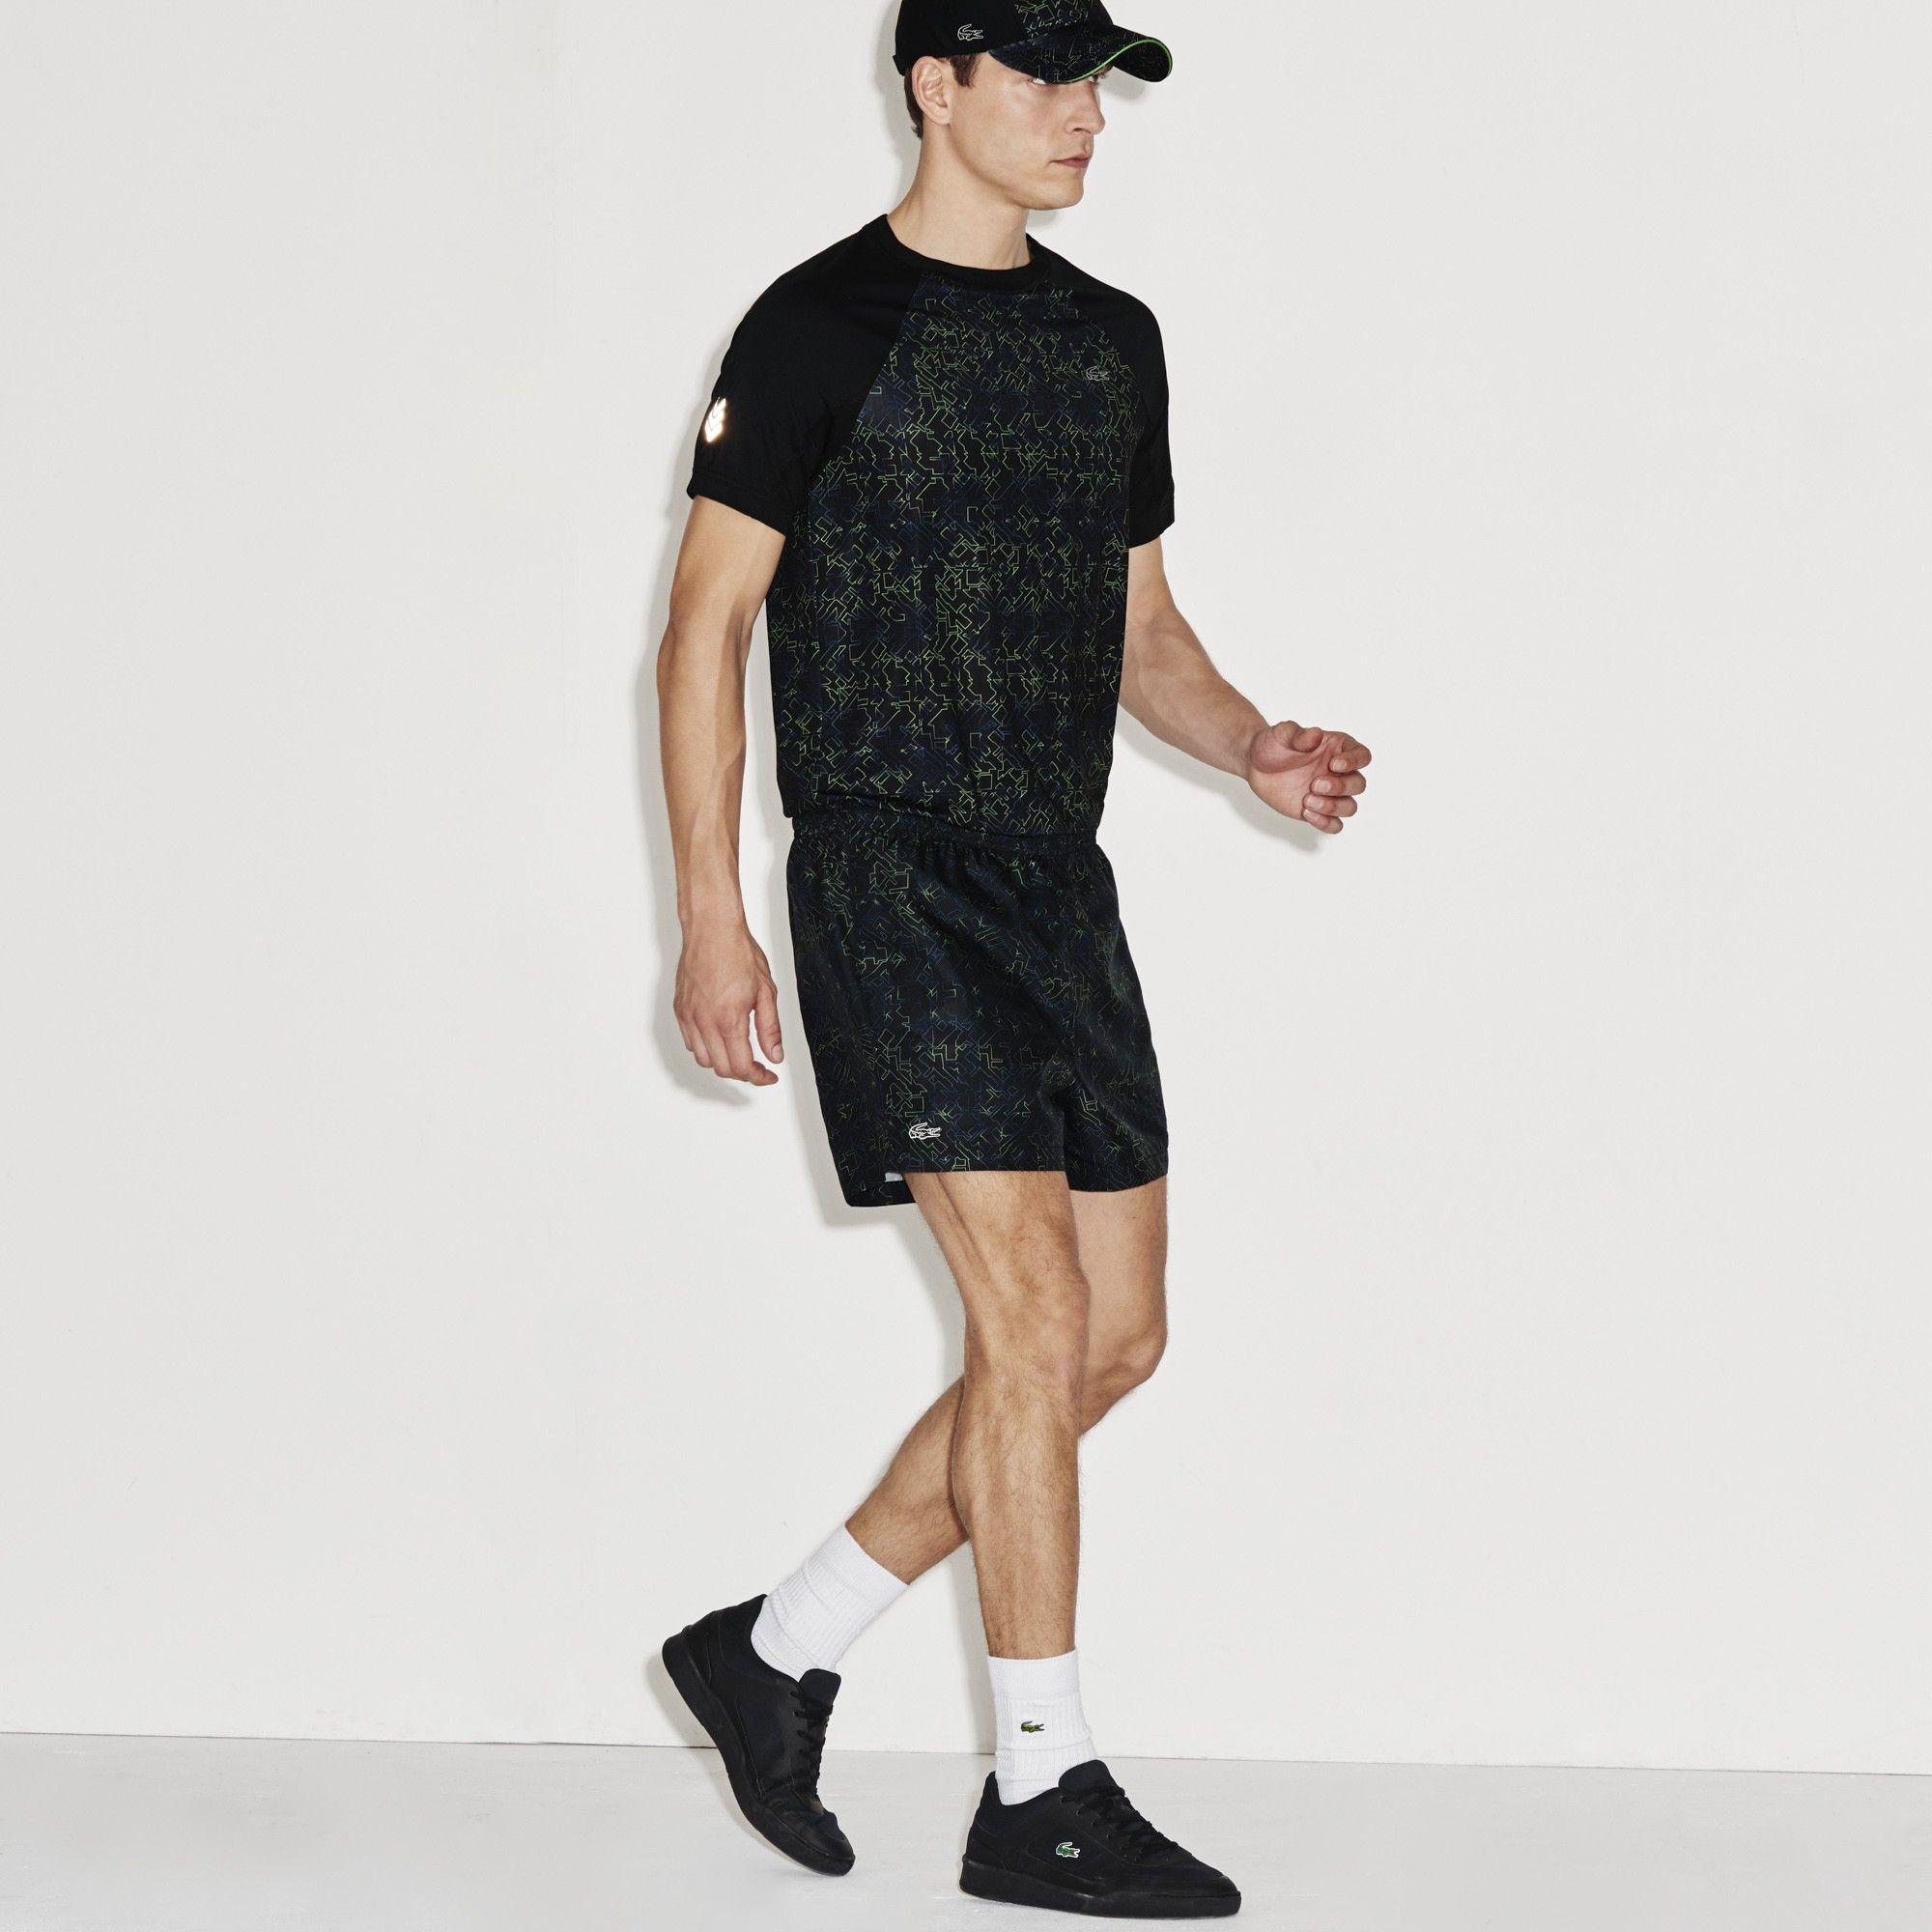 63df2dca LACOSTE Men's SPORT Stretch Print Tennis Shorts - BLACK/FRANCE ...